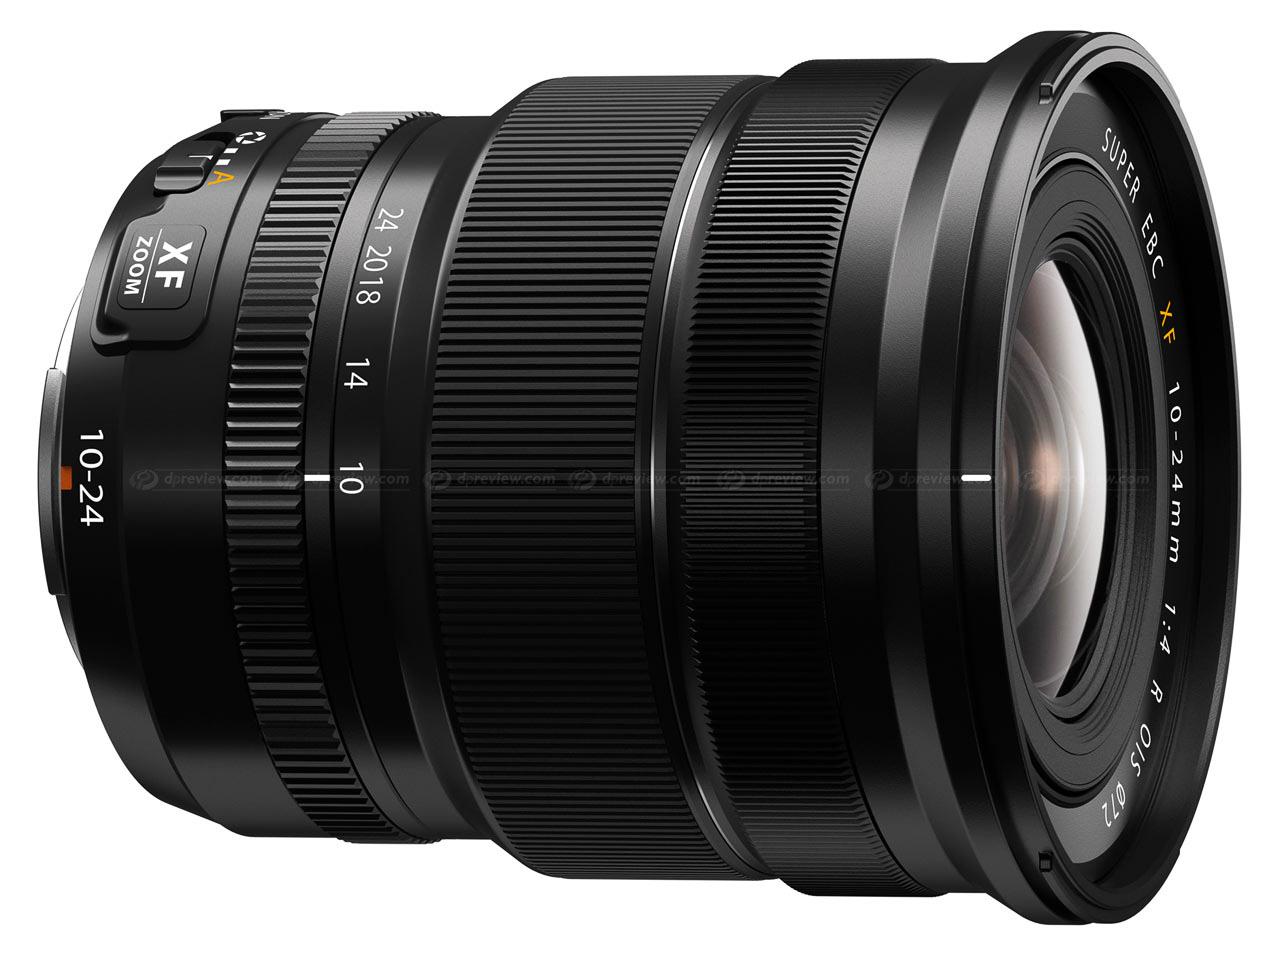 Fuji 10-24mm f/4 OIS